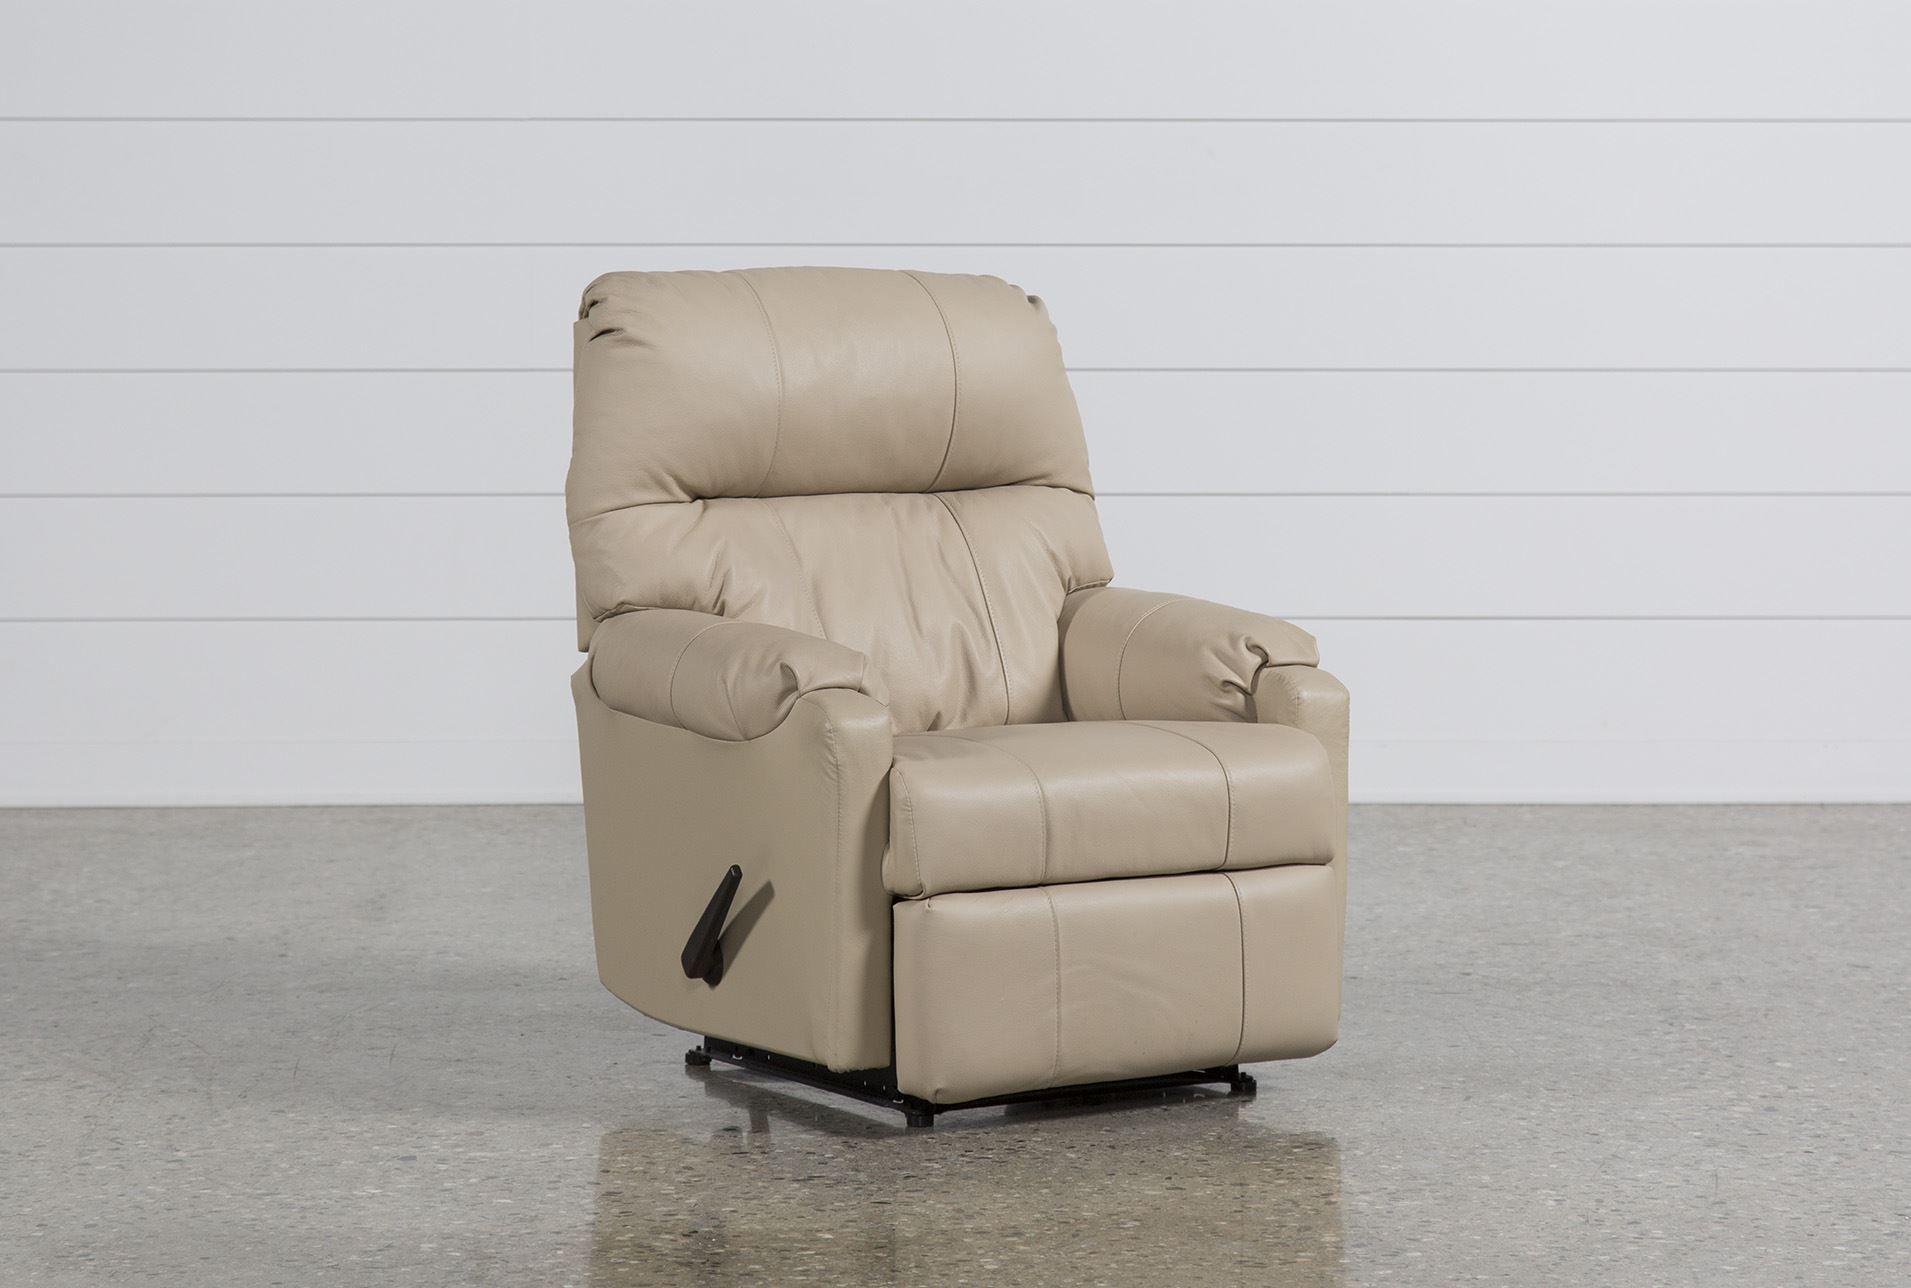 Munroe Ii Leather Wallaway Recliner Recliner Living Furniture Furniture